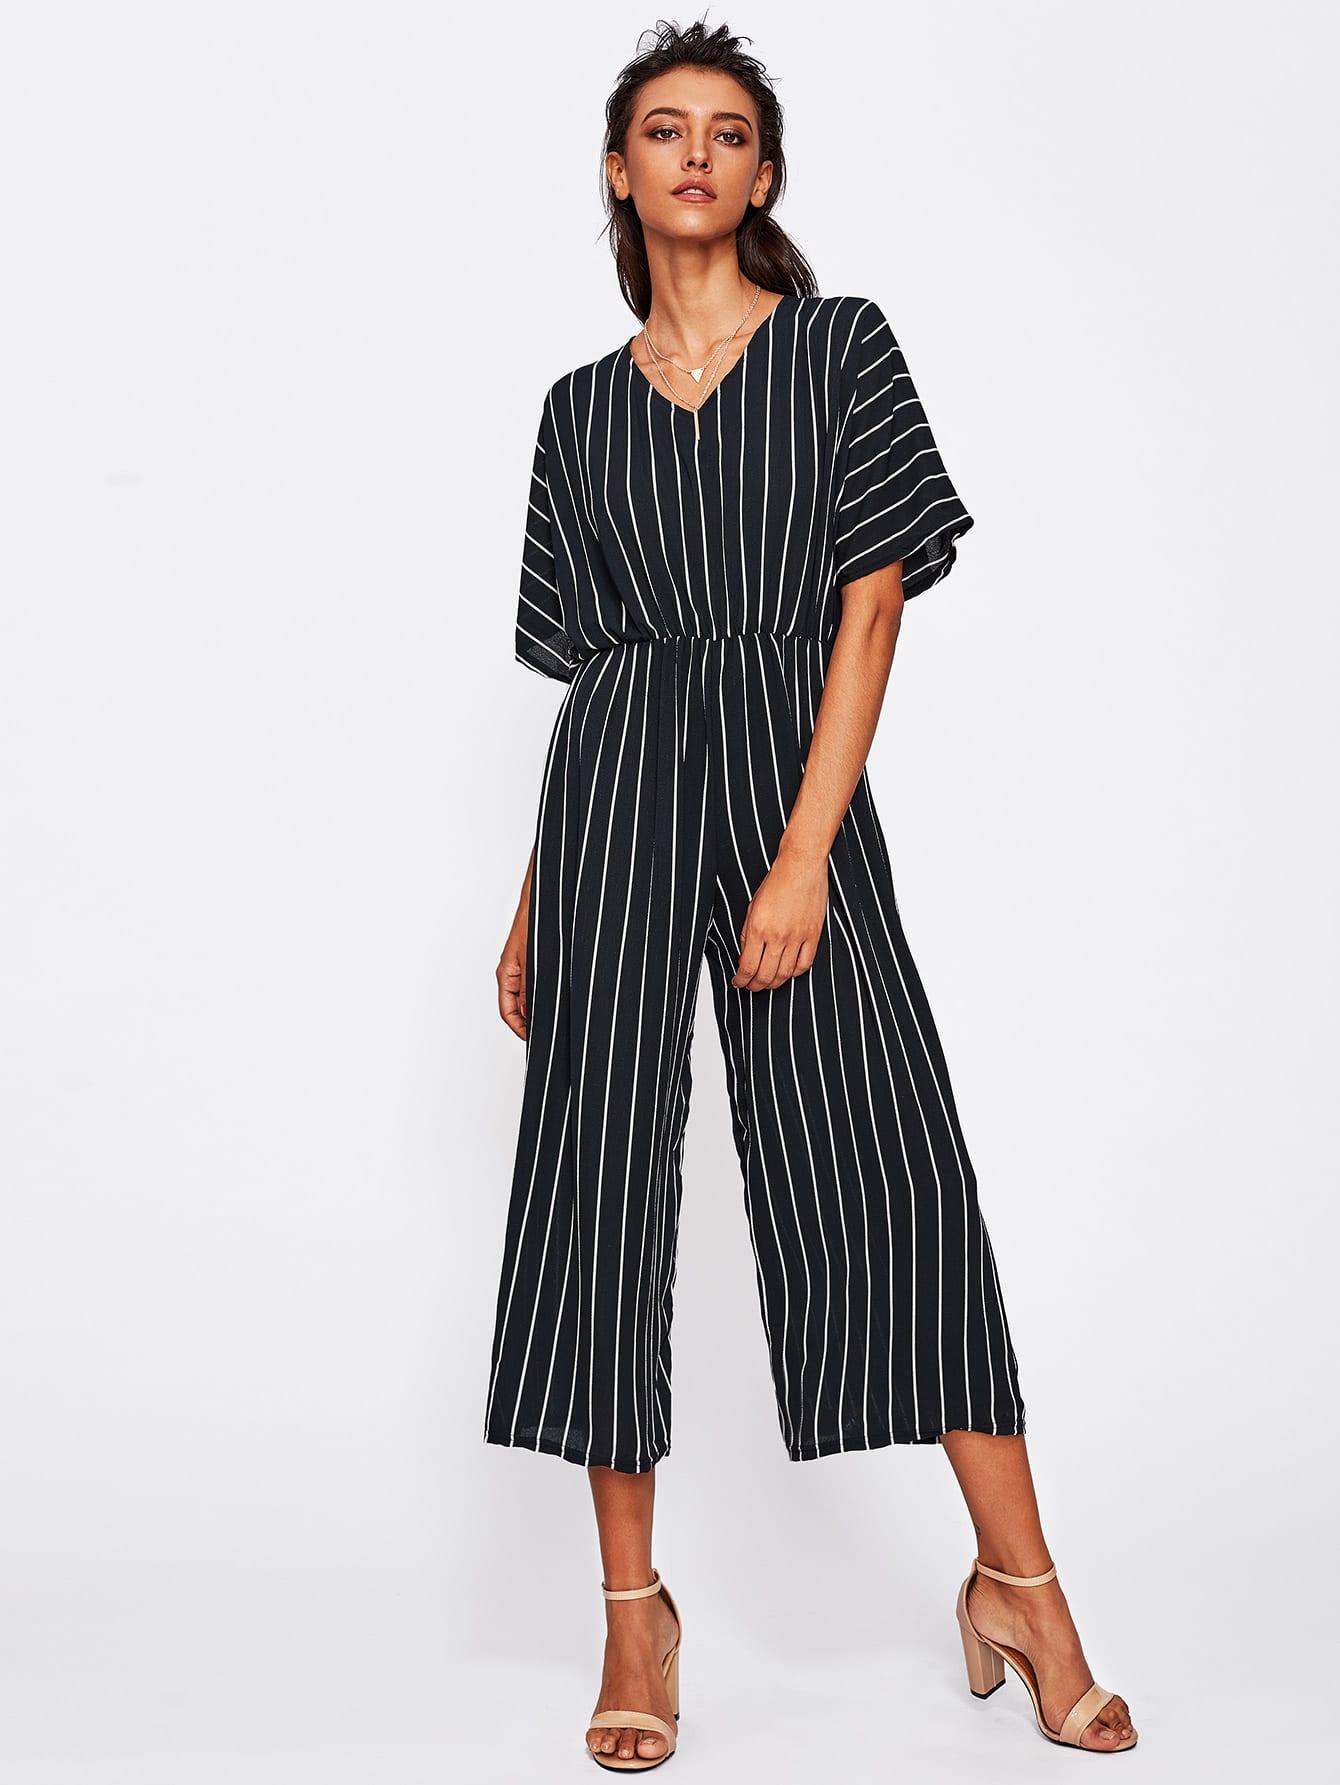 Overlap Tie Back Vertical Striped Wide Leg Jumpsuit